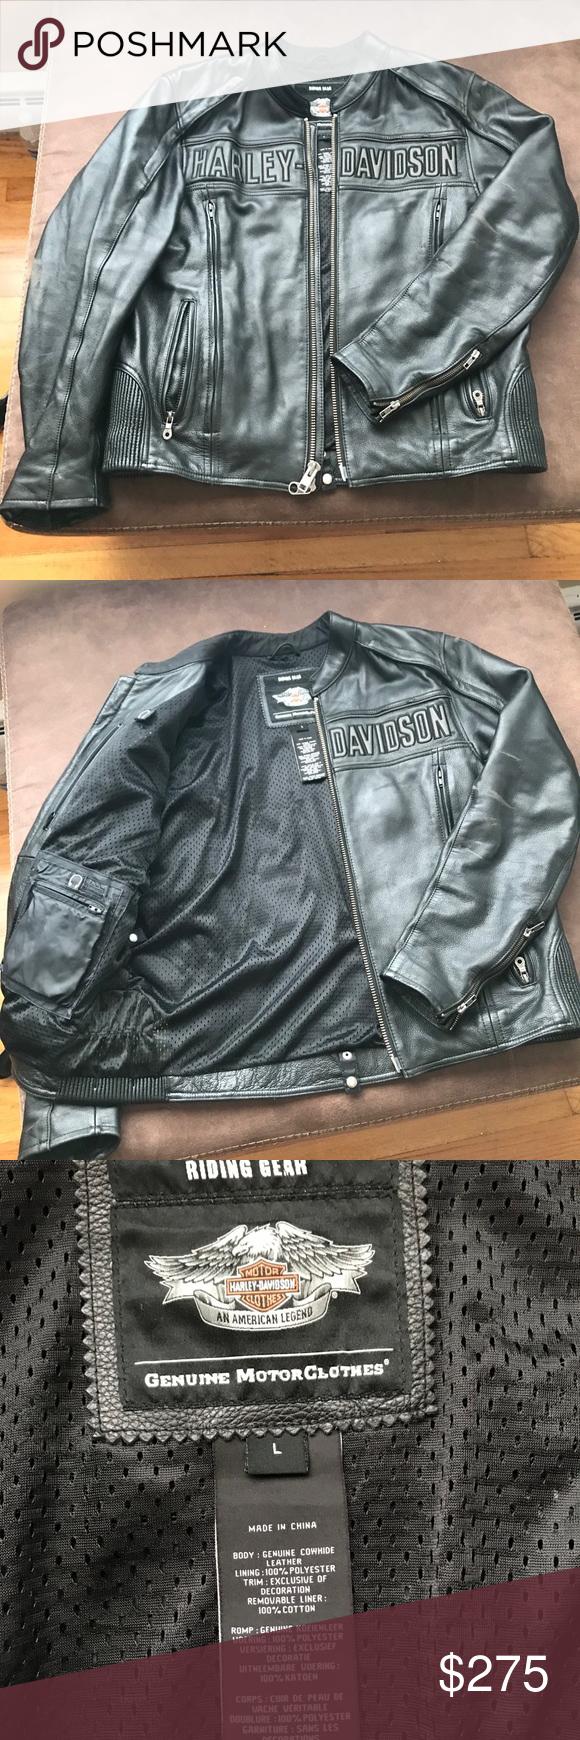 Harley Davidson Leather Jacket Harley Davidson Leather Jackets Leather Jacket Harley Davidson Jacket [ 1740 x 580 Pixel ]